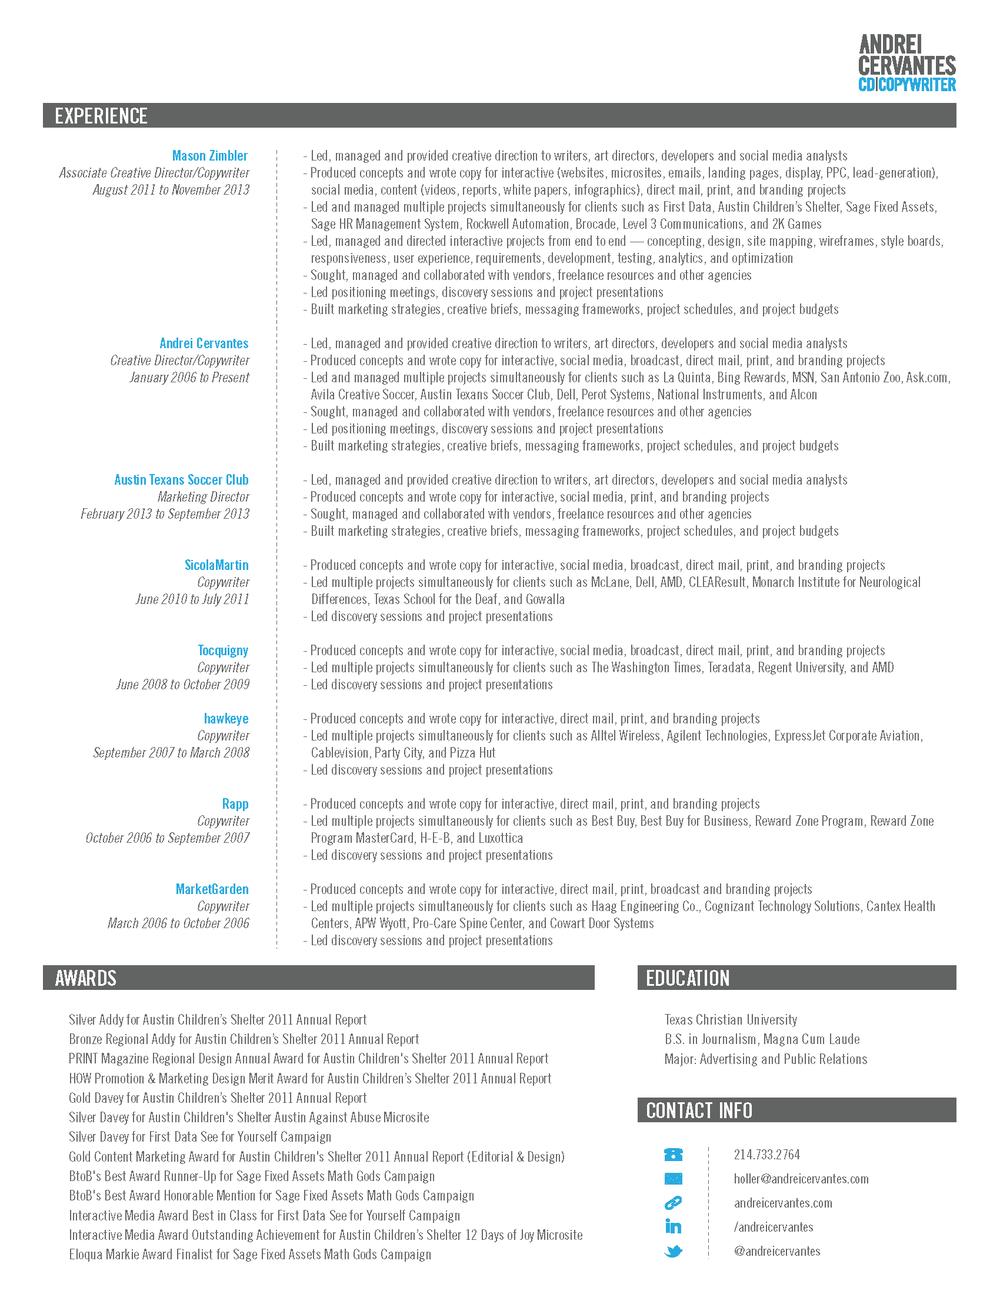 Andrei Cervantes - Resume.png